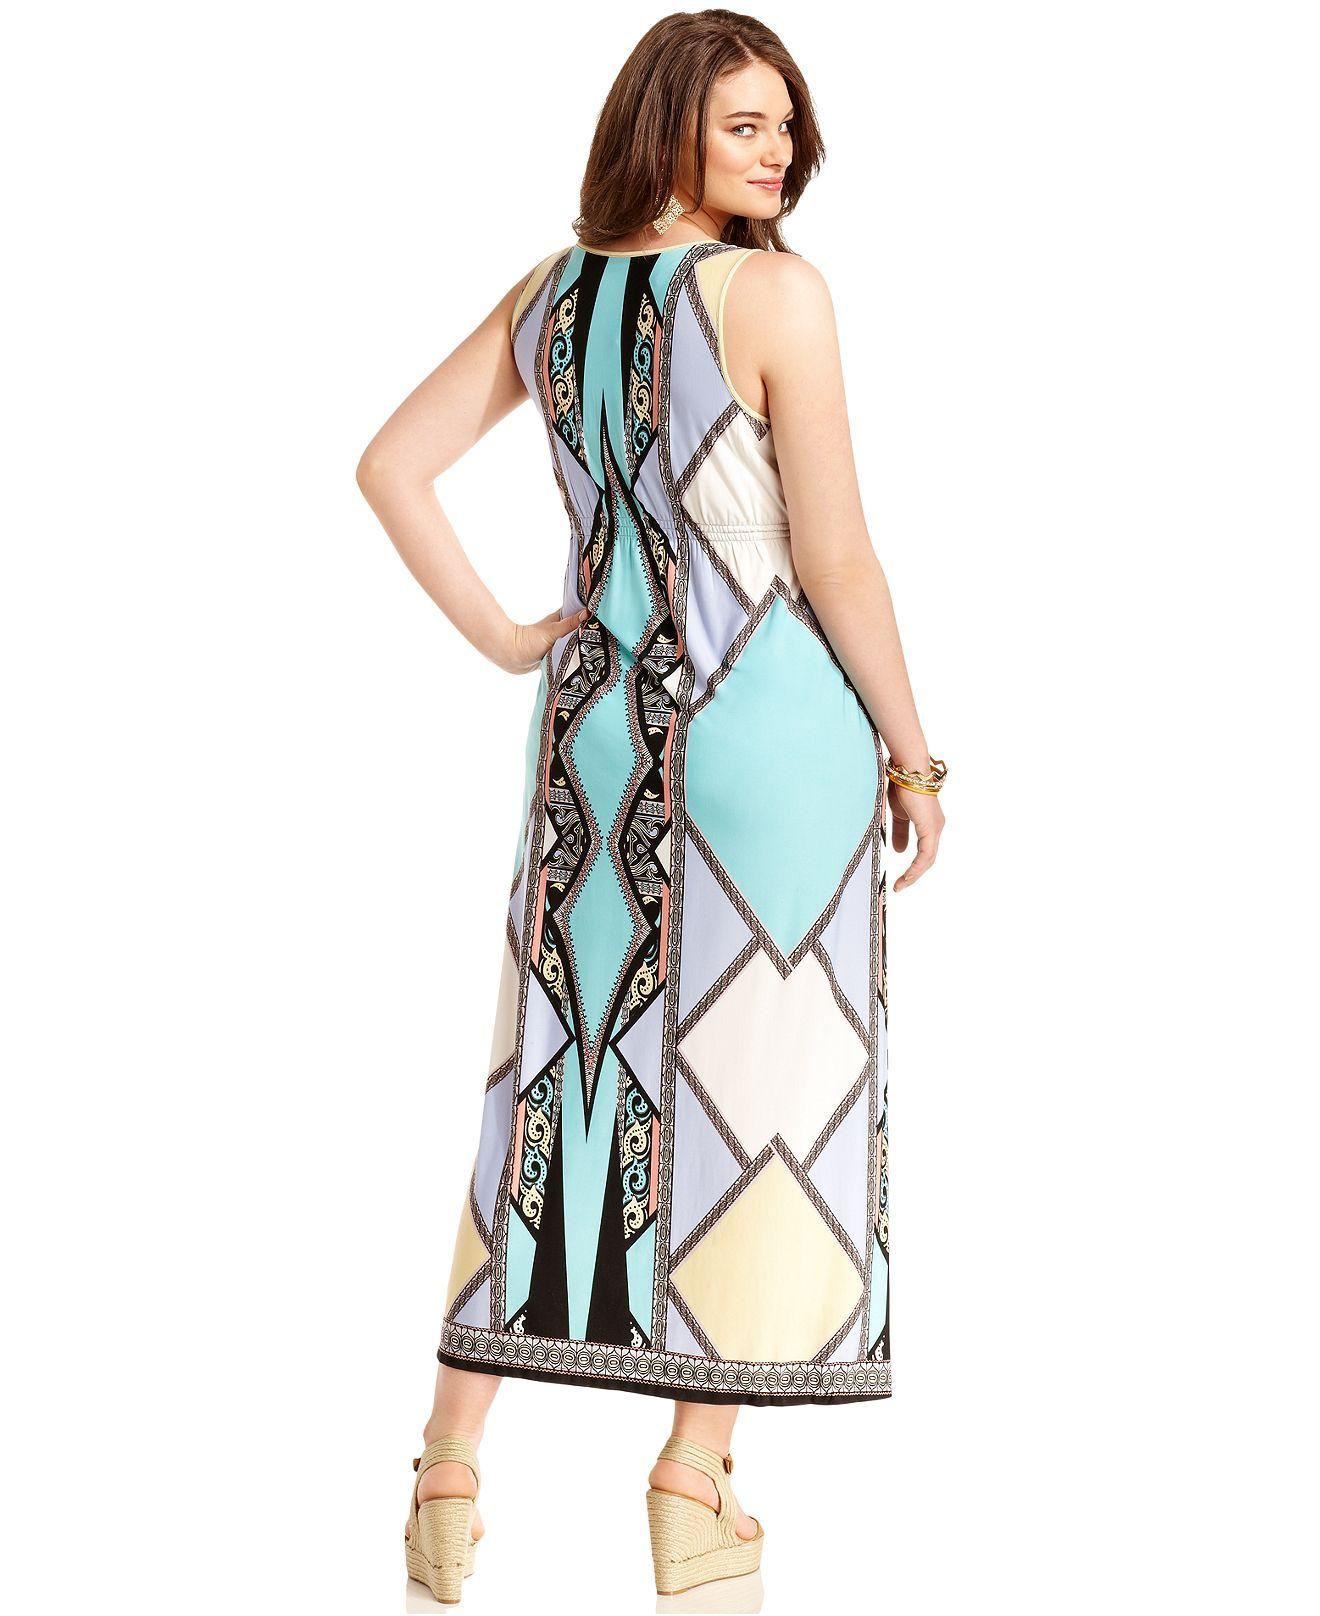 One World Plus Size Dress, Sleeveless Printed Maxi - Plus ...